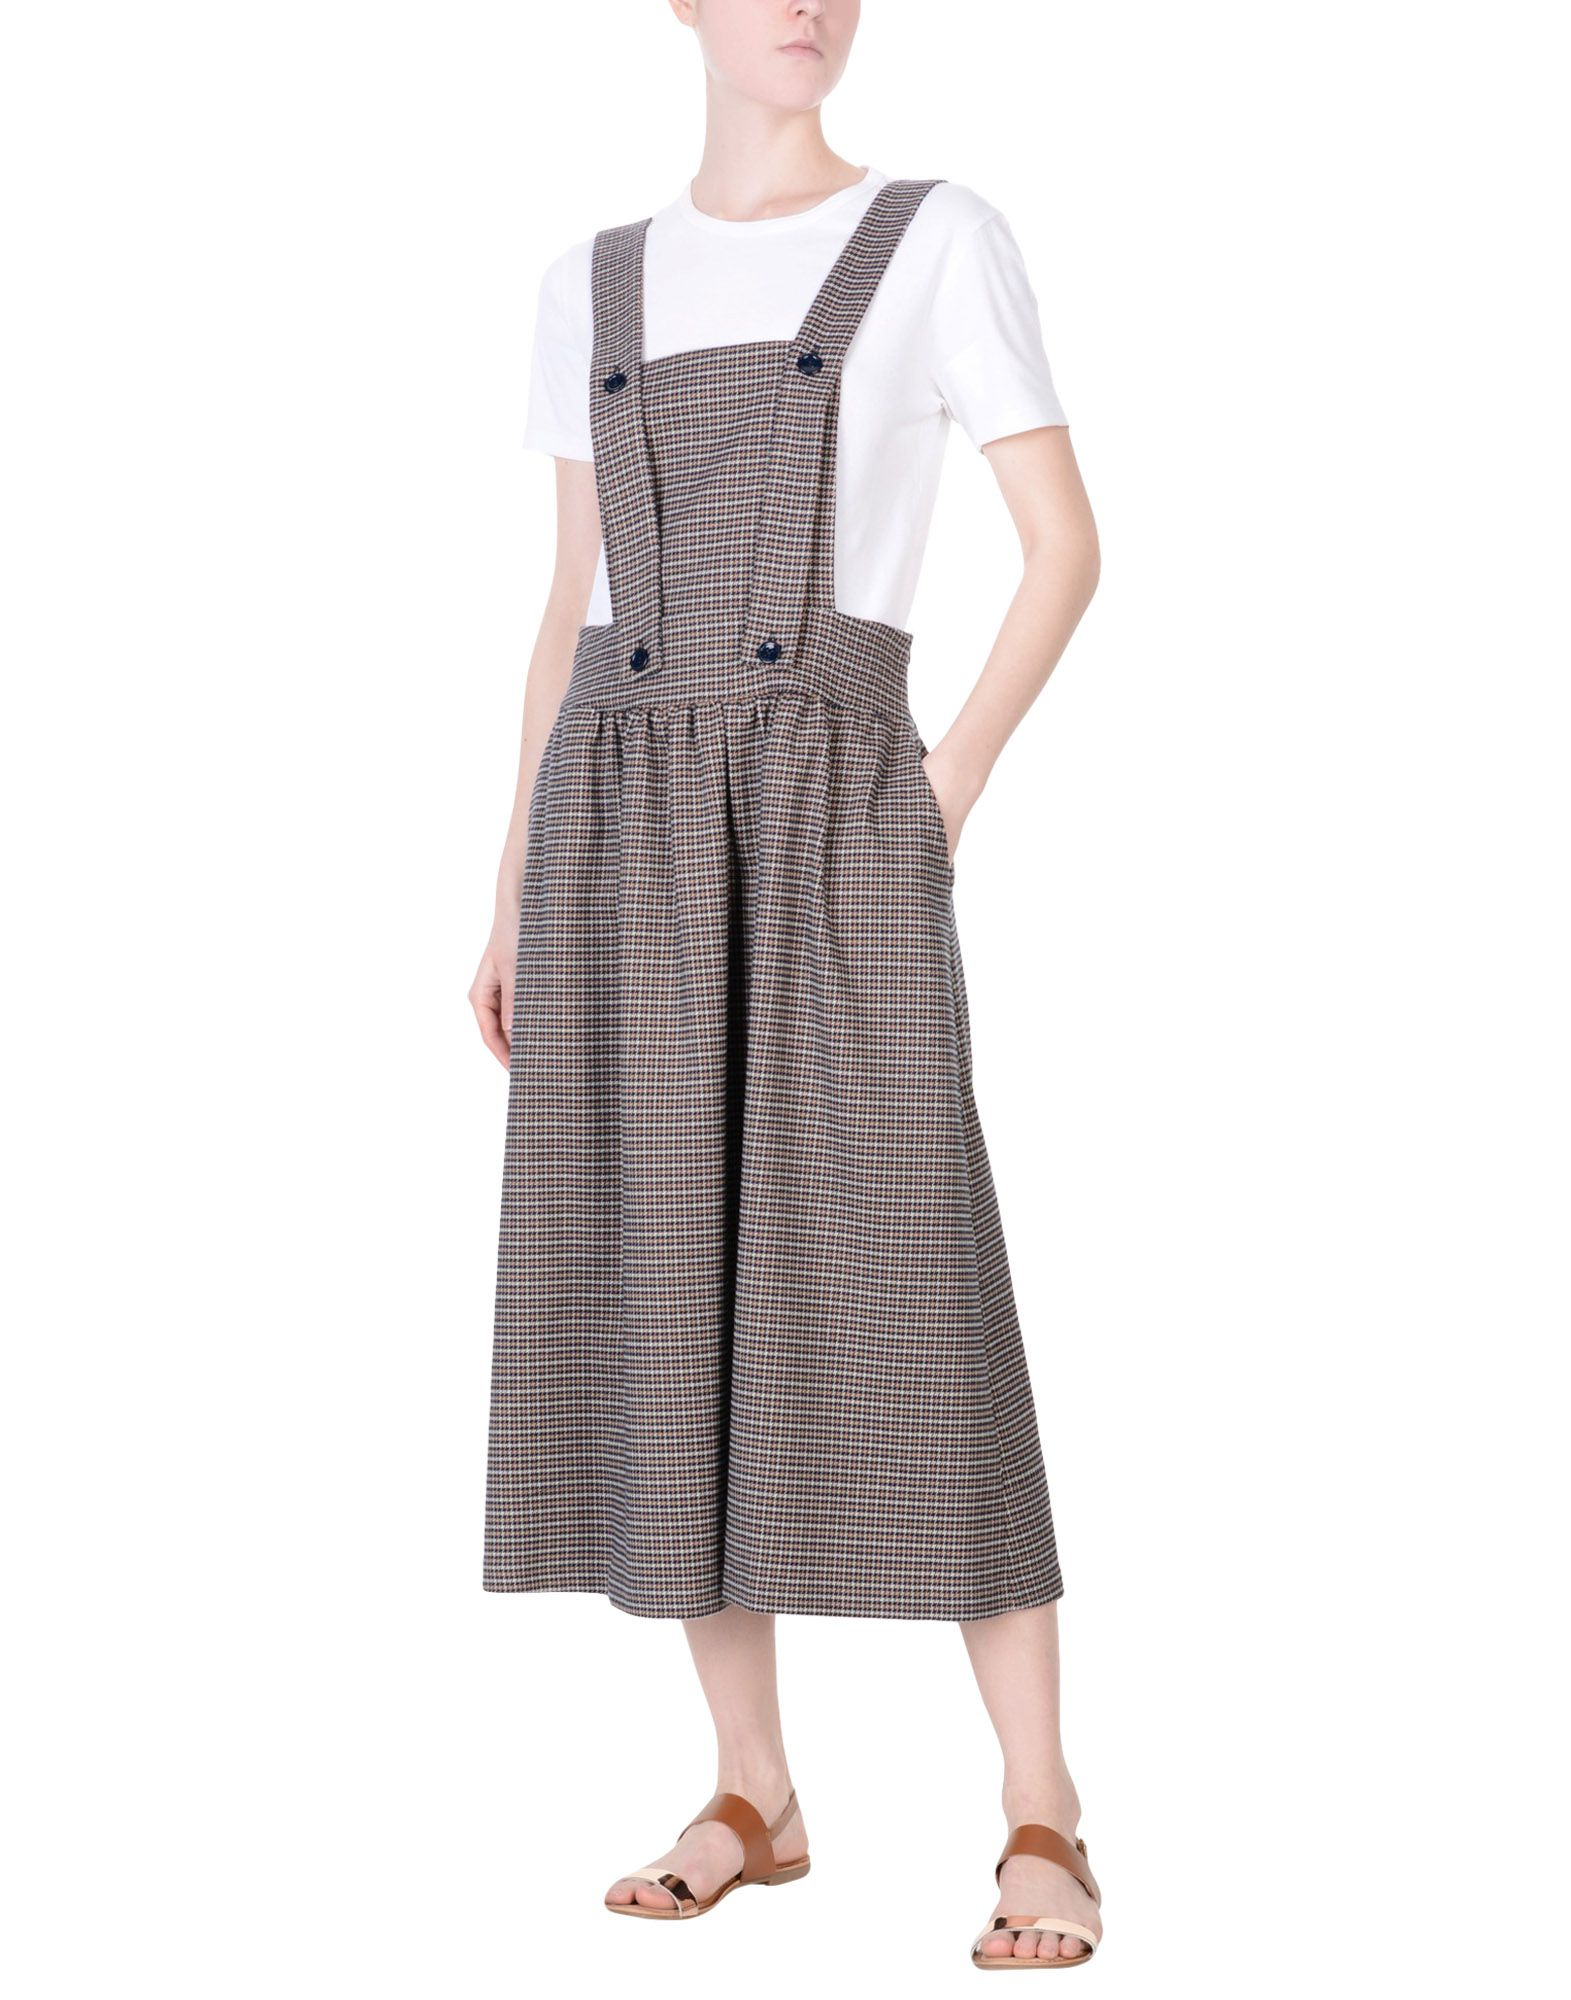 PAOLO CASALINI Юбочный комбинезон paolo casalini длинная юбка